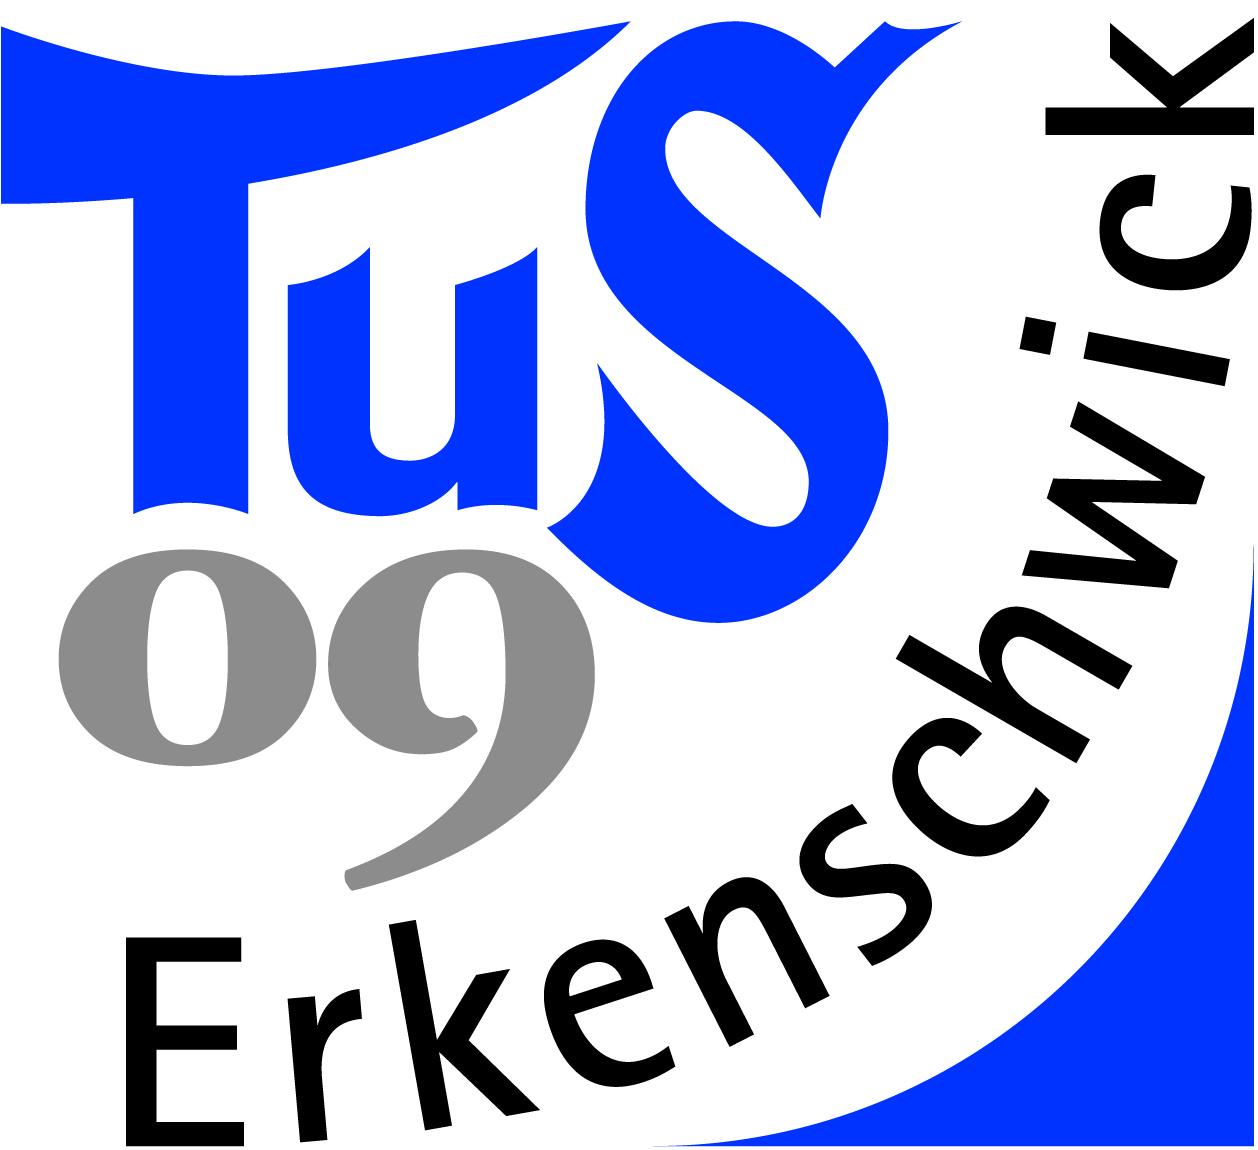 TuS 09 Erkenschwick e.V.